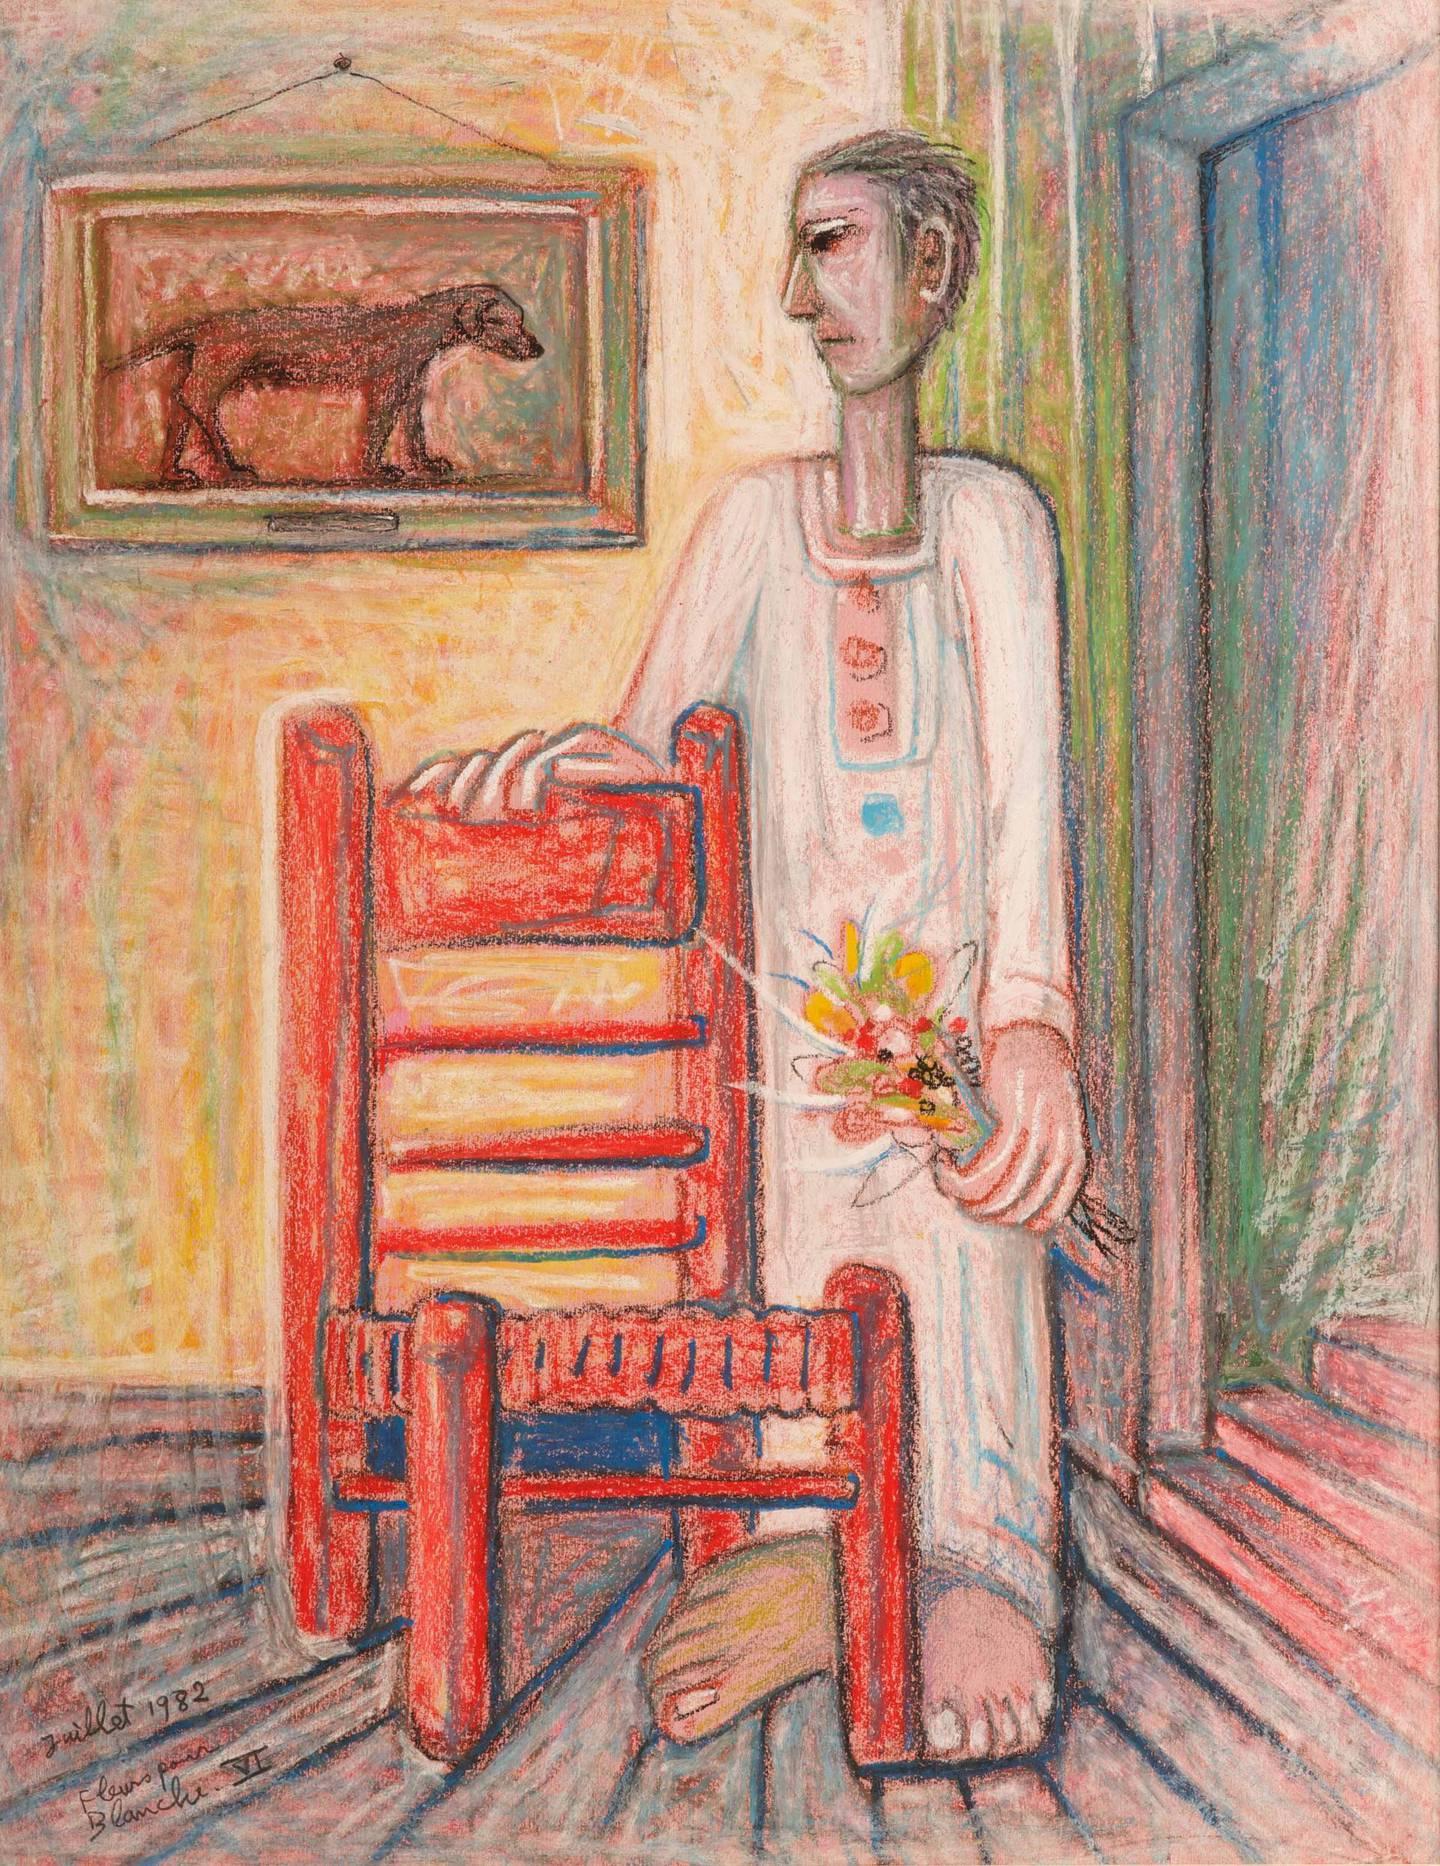 SR008_LR_Samir Rafi, Fluer Pour Blanche VI, 1982, Pastel on Paper,49x64cm, Image courtesy of Ubuntu Art Gallery